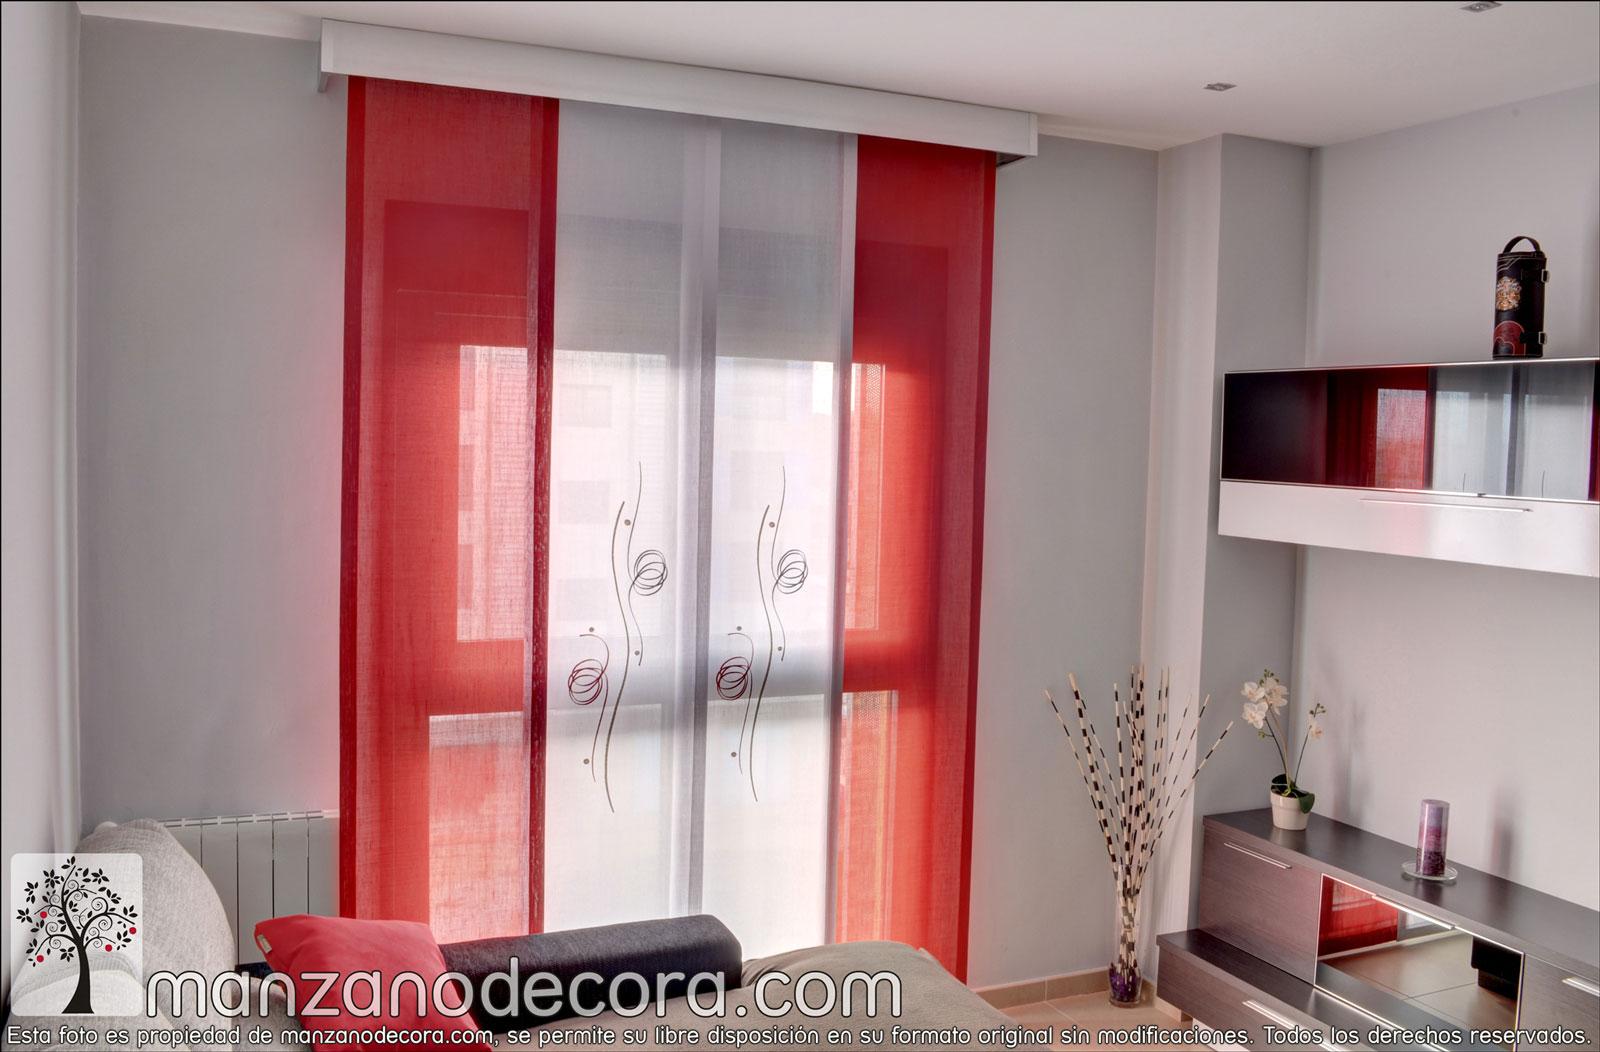 Paneles japoneses cortinas manzanodecora for Telas para paneles japoneses